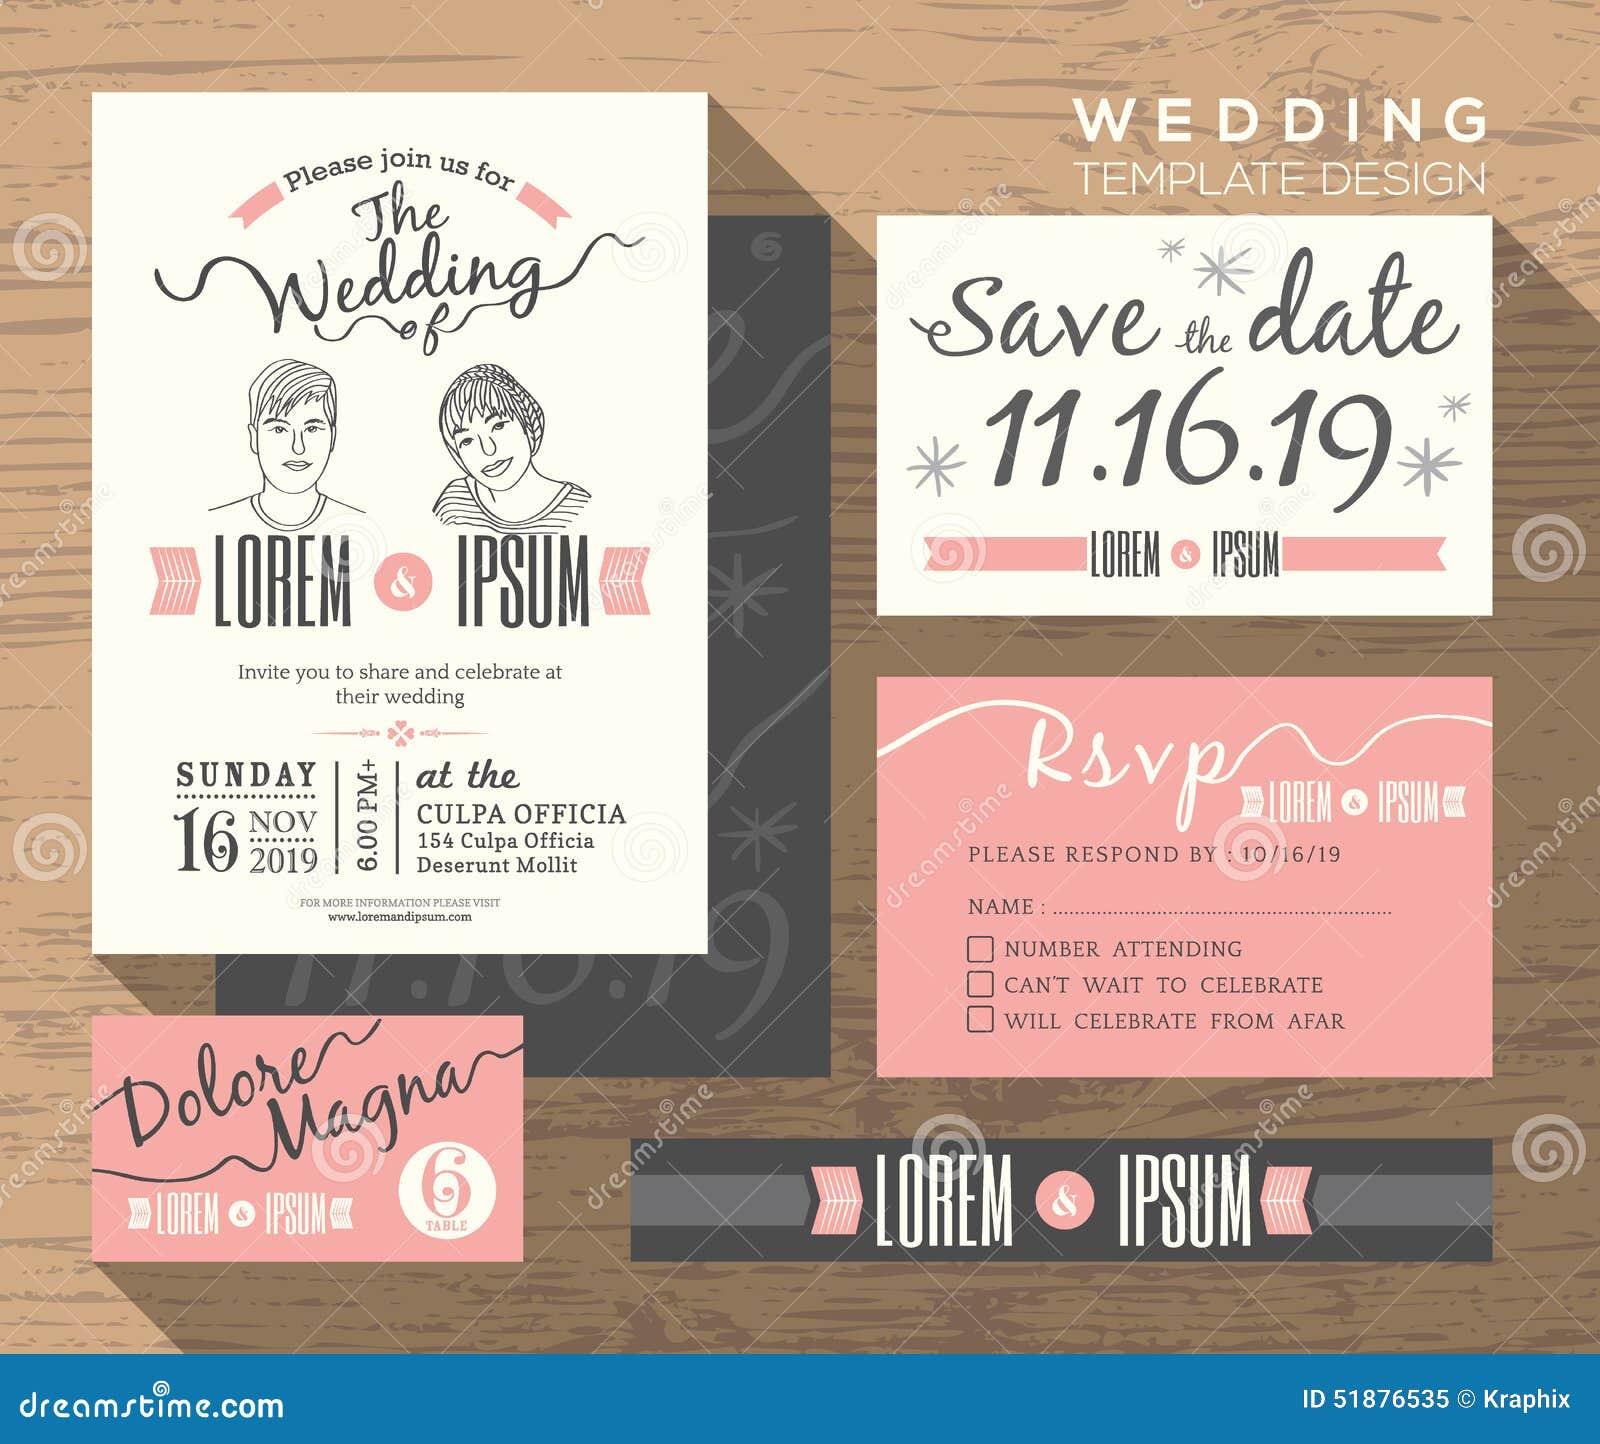 Invitation Designs Templates for great invitation example